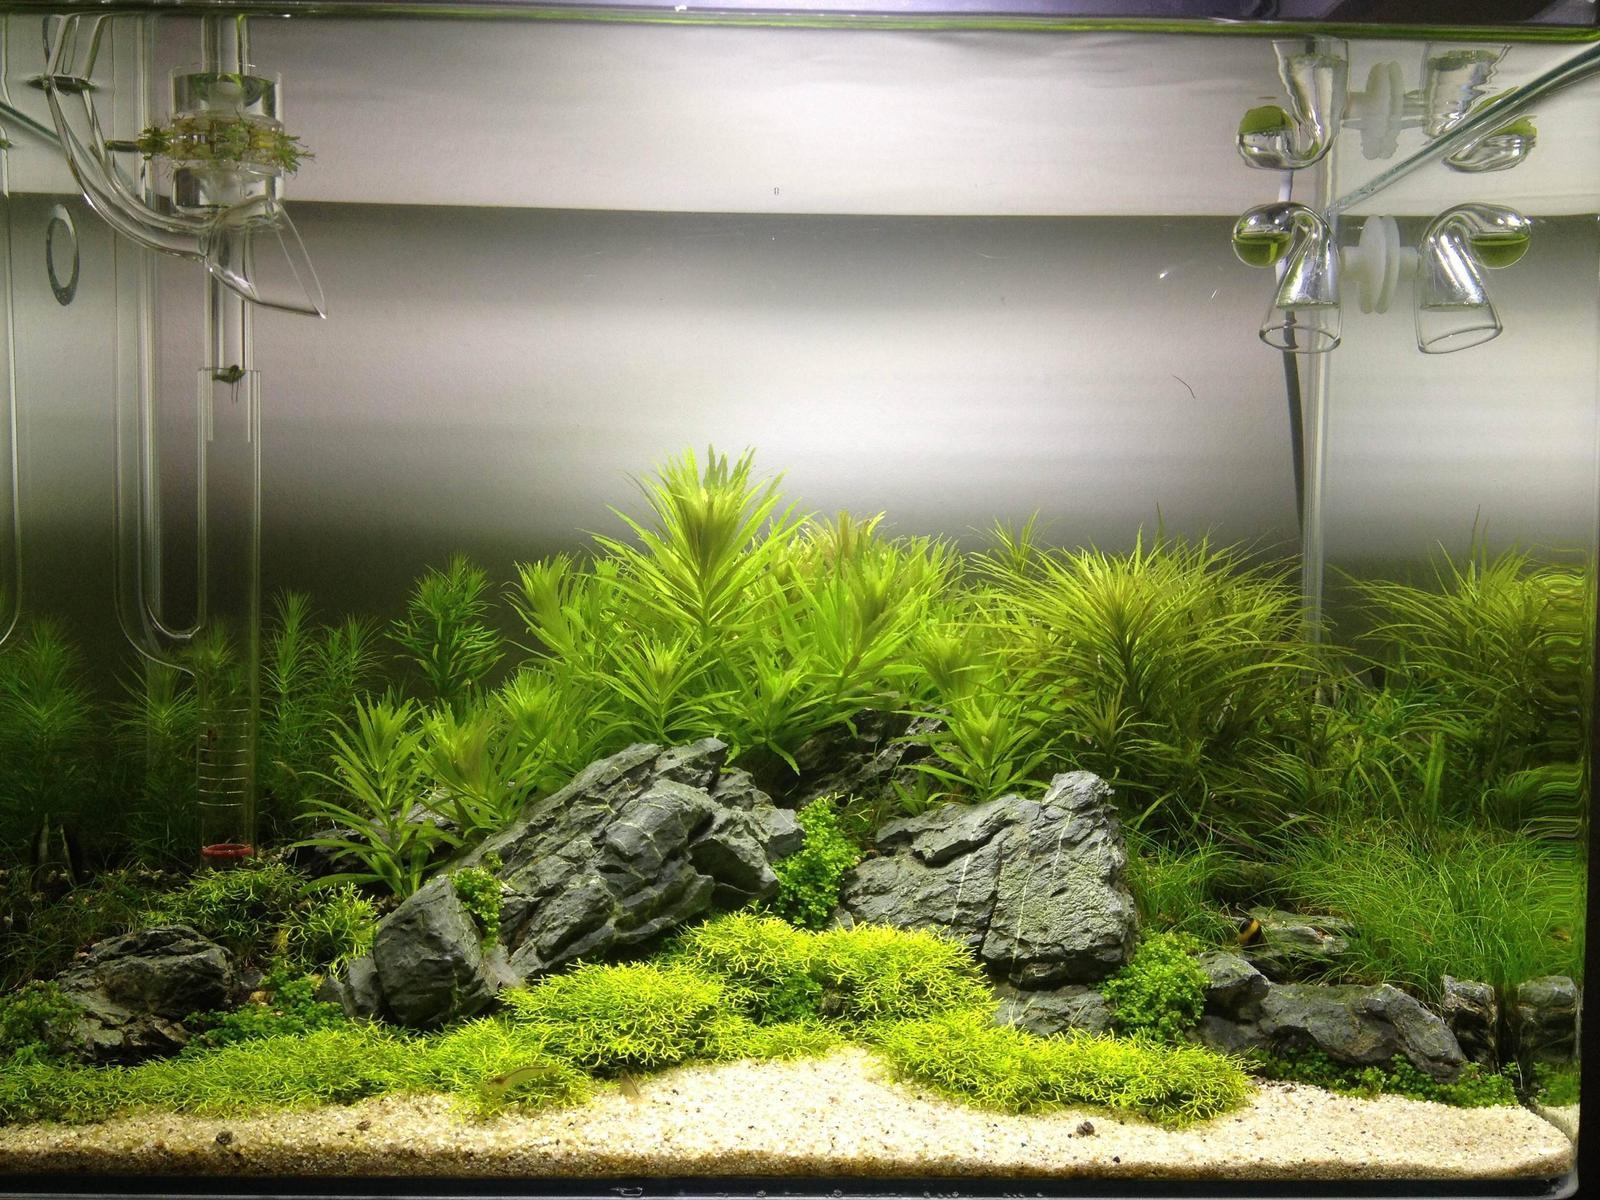 Fish tank antibiotics - 47ajwqy Jpg